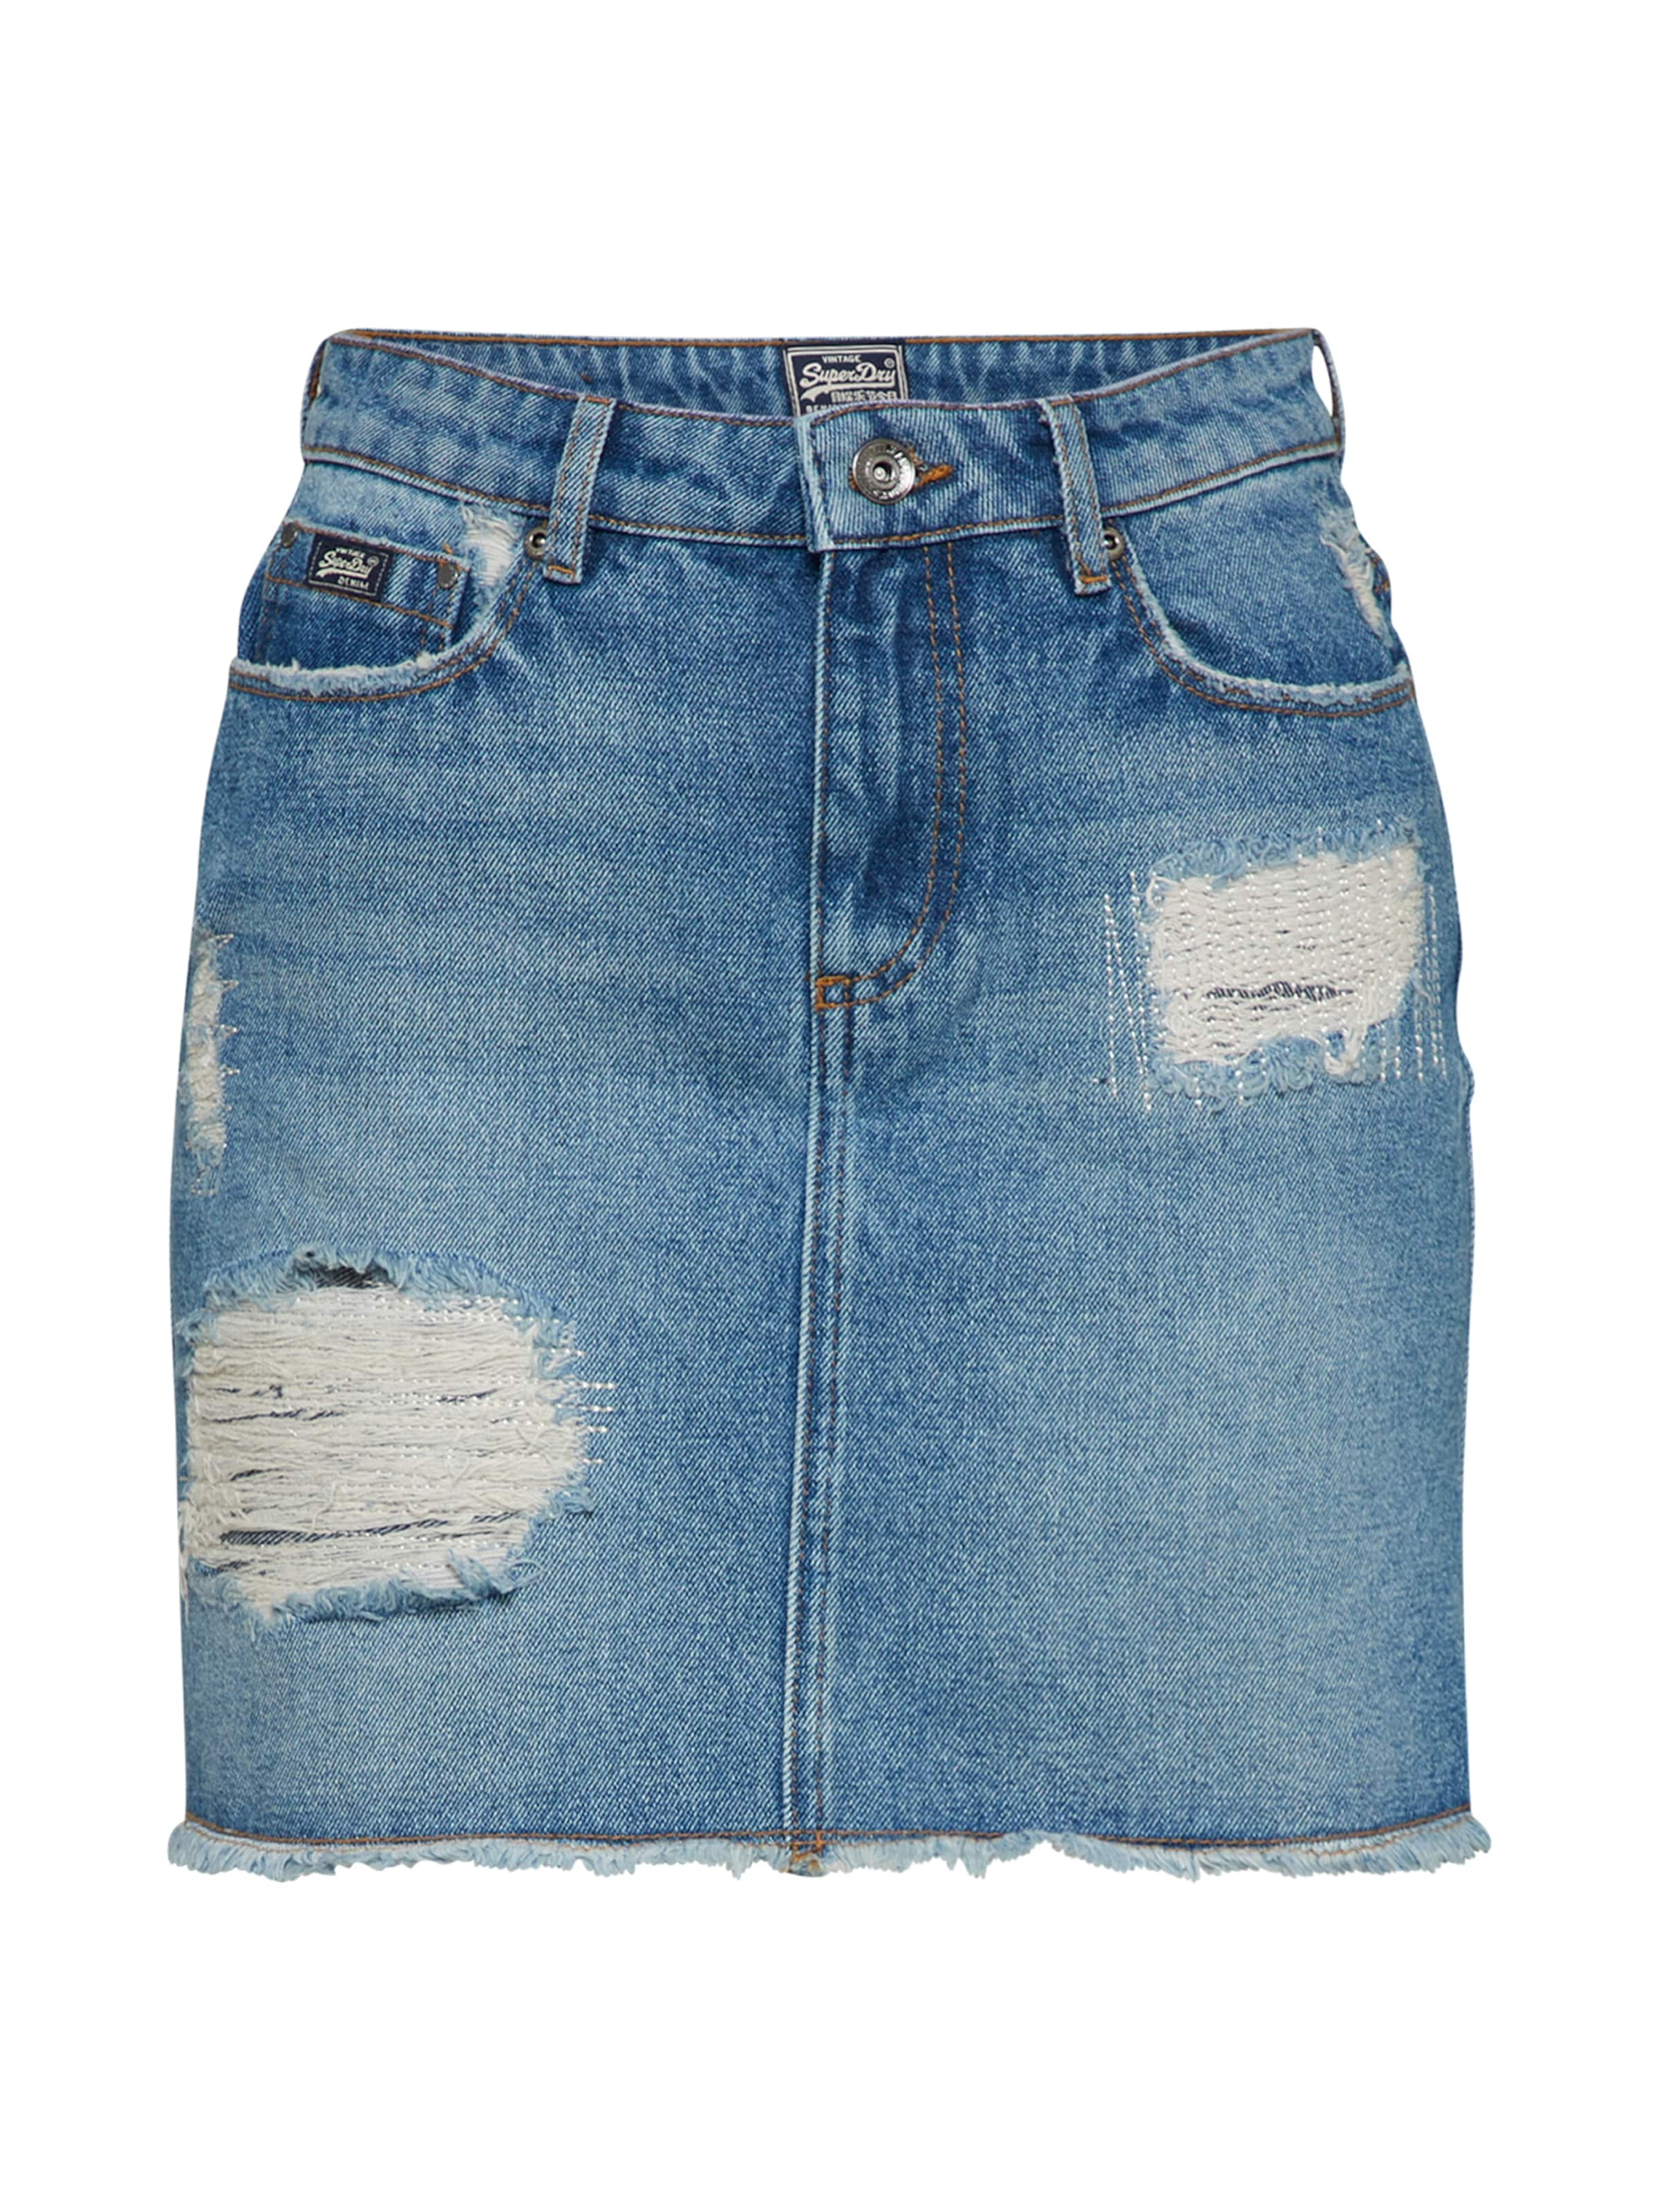 Skirt' Bleu Denim En Jupe Mini 'denim Superdry wntOq64Uw